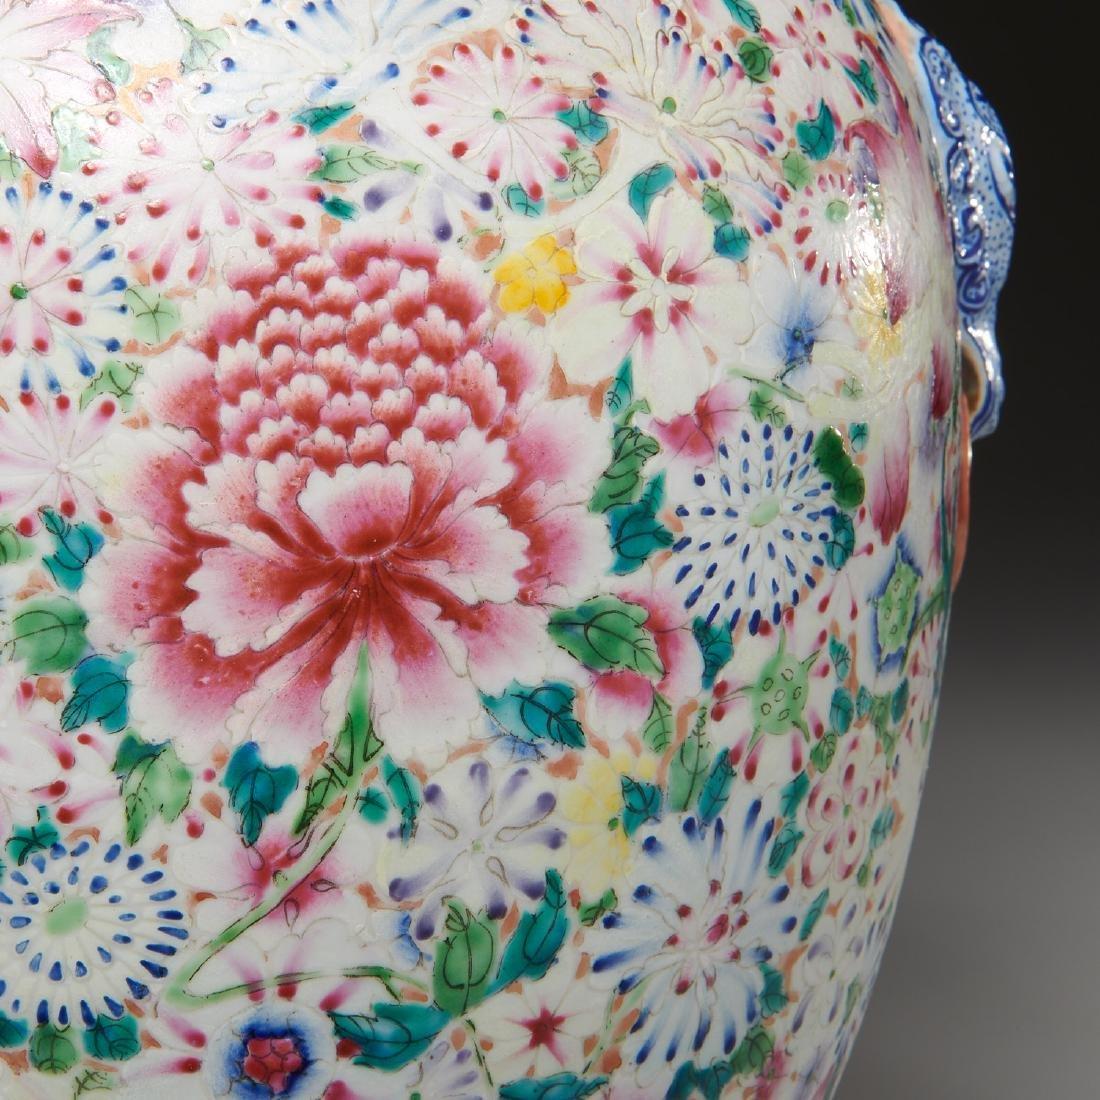 Chinese porcelain millefleurs vase - 4